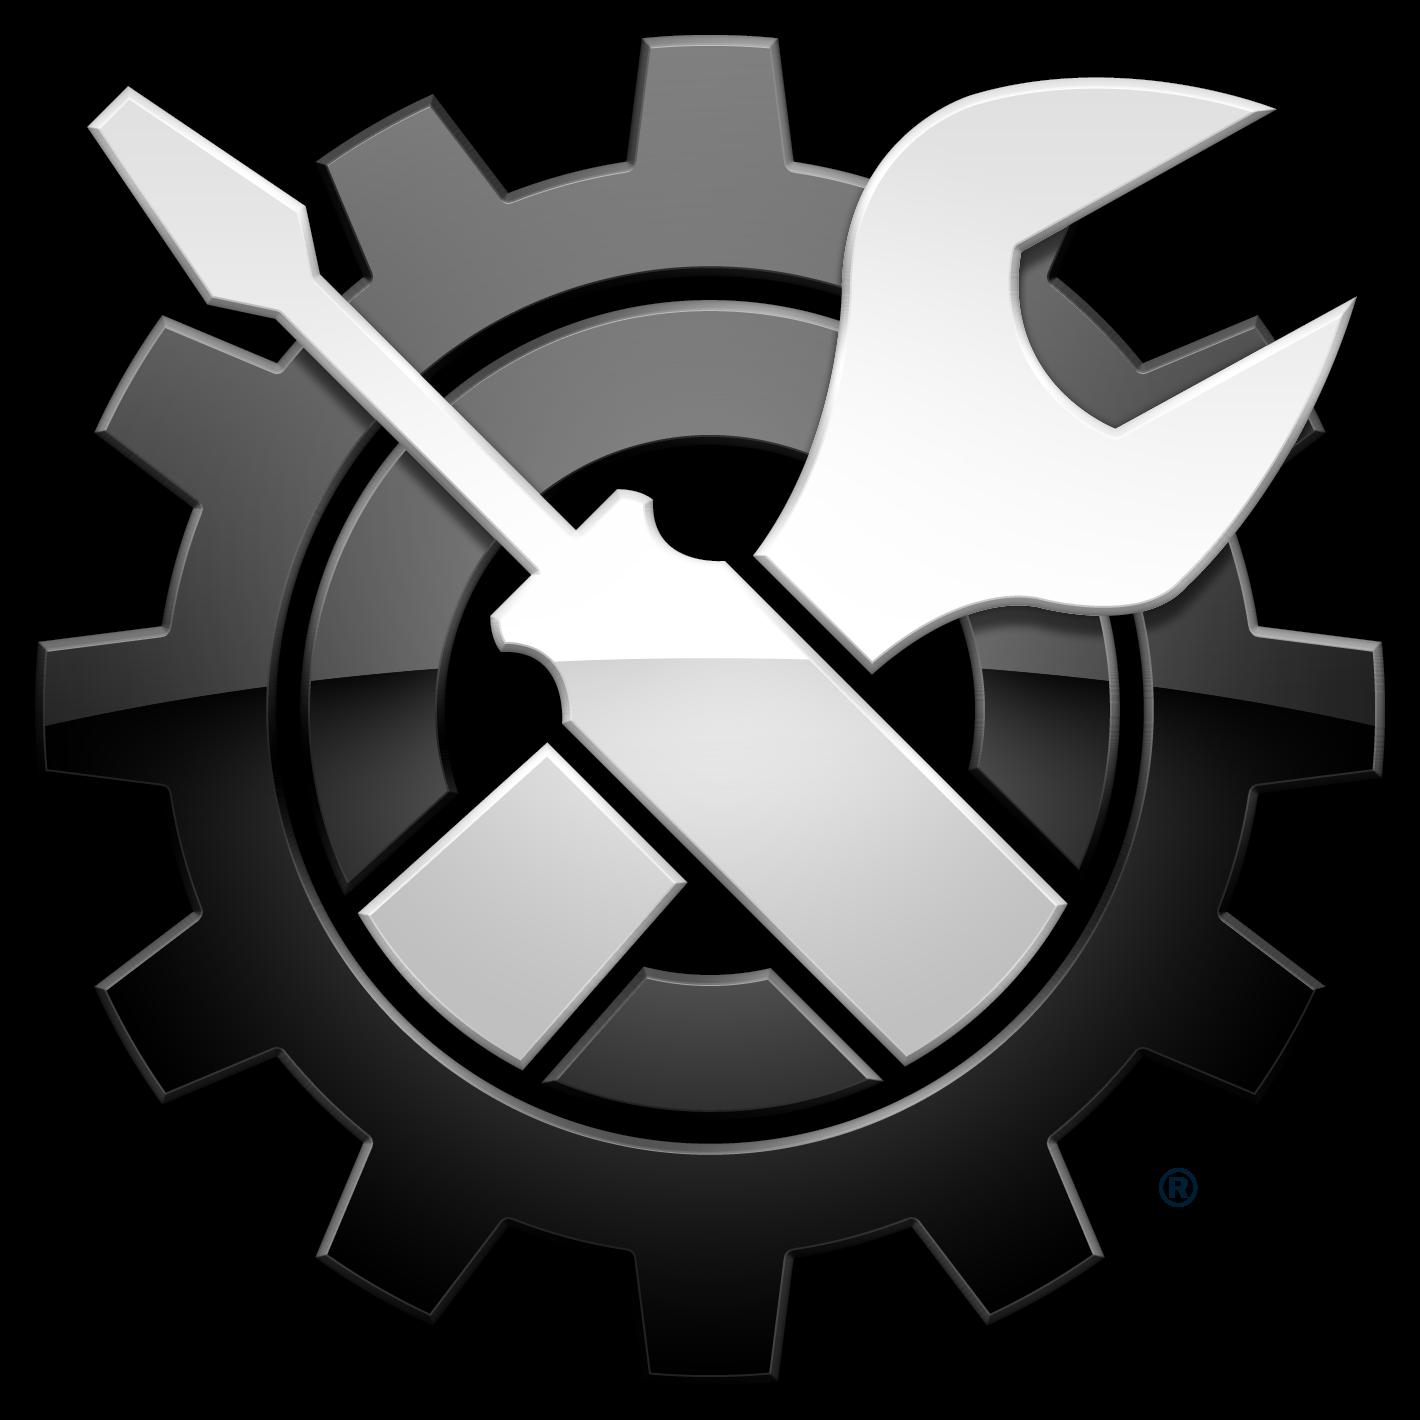 Mechanic clipart logo. Logos software system boosts